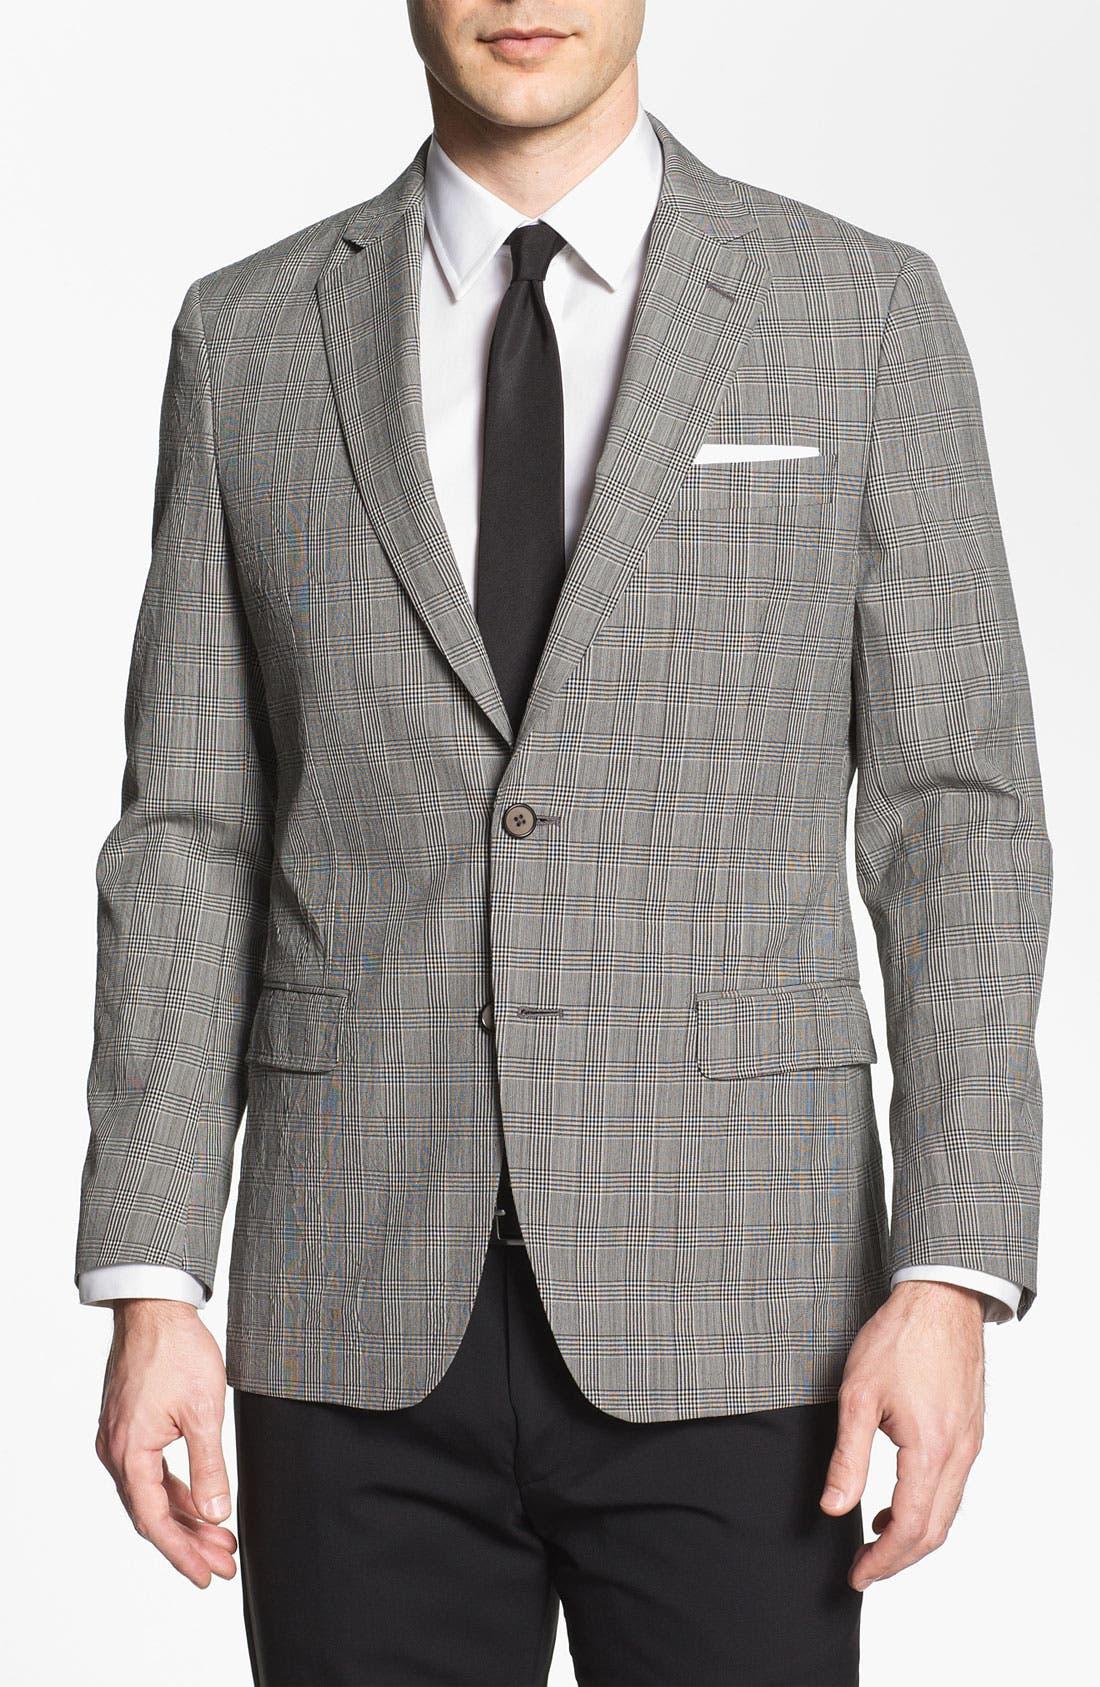 Alternate Image 1 Selected - Michael Kors Trim Fit Plaid Wool Sportcoat